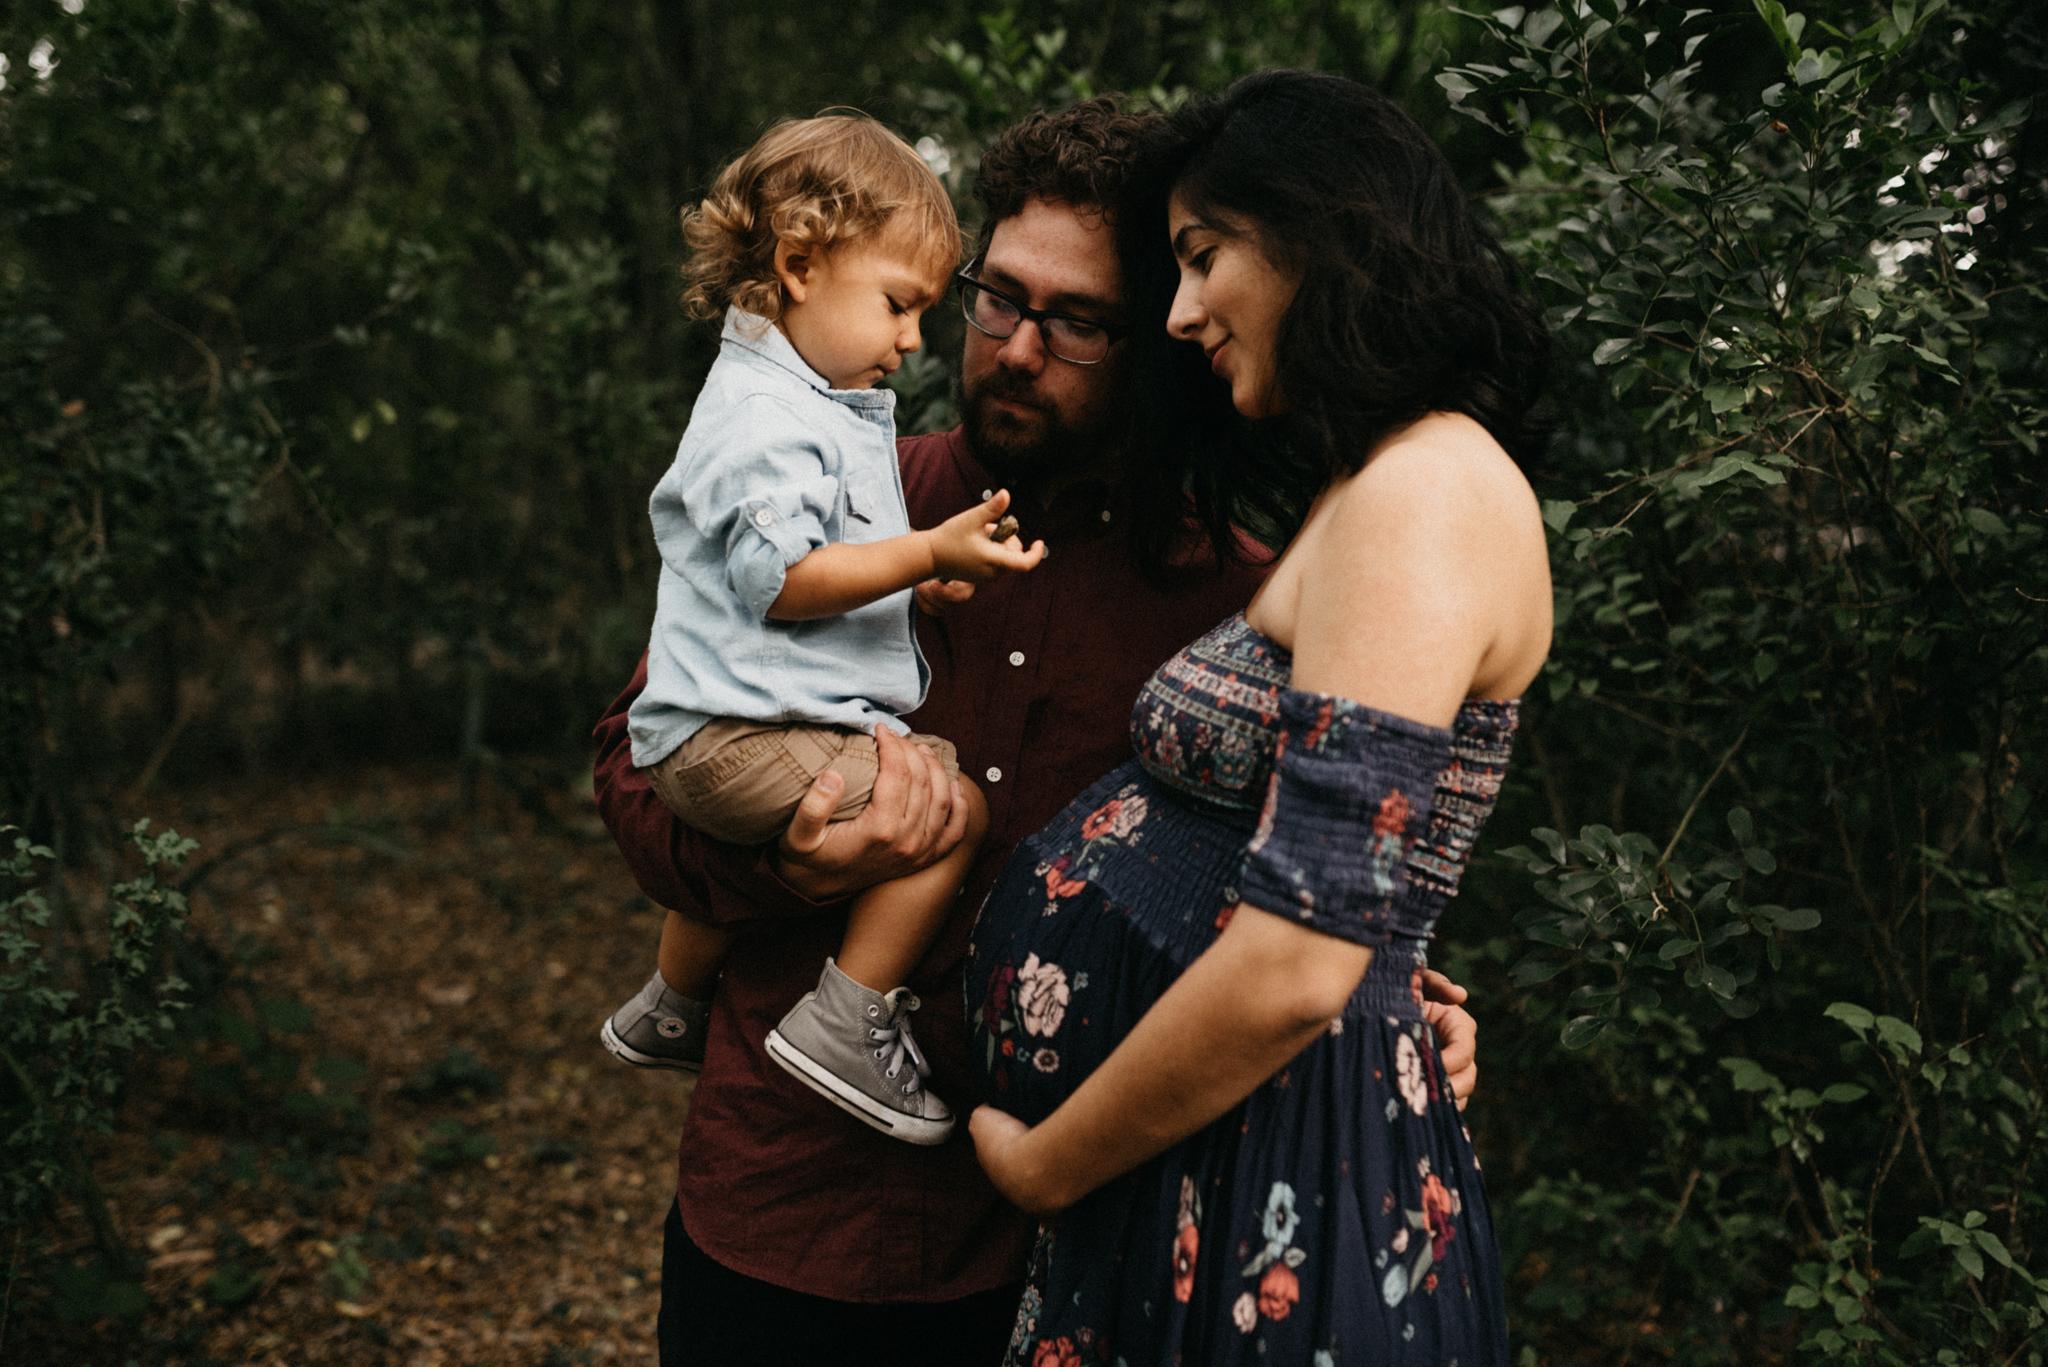 Forest-Woodsy-Family-Maternity-Rustic-Motherhood-Session-Kerlyn-Van-Gelder-Photography-Corpus-Christi-Photographer